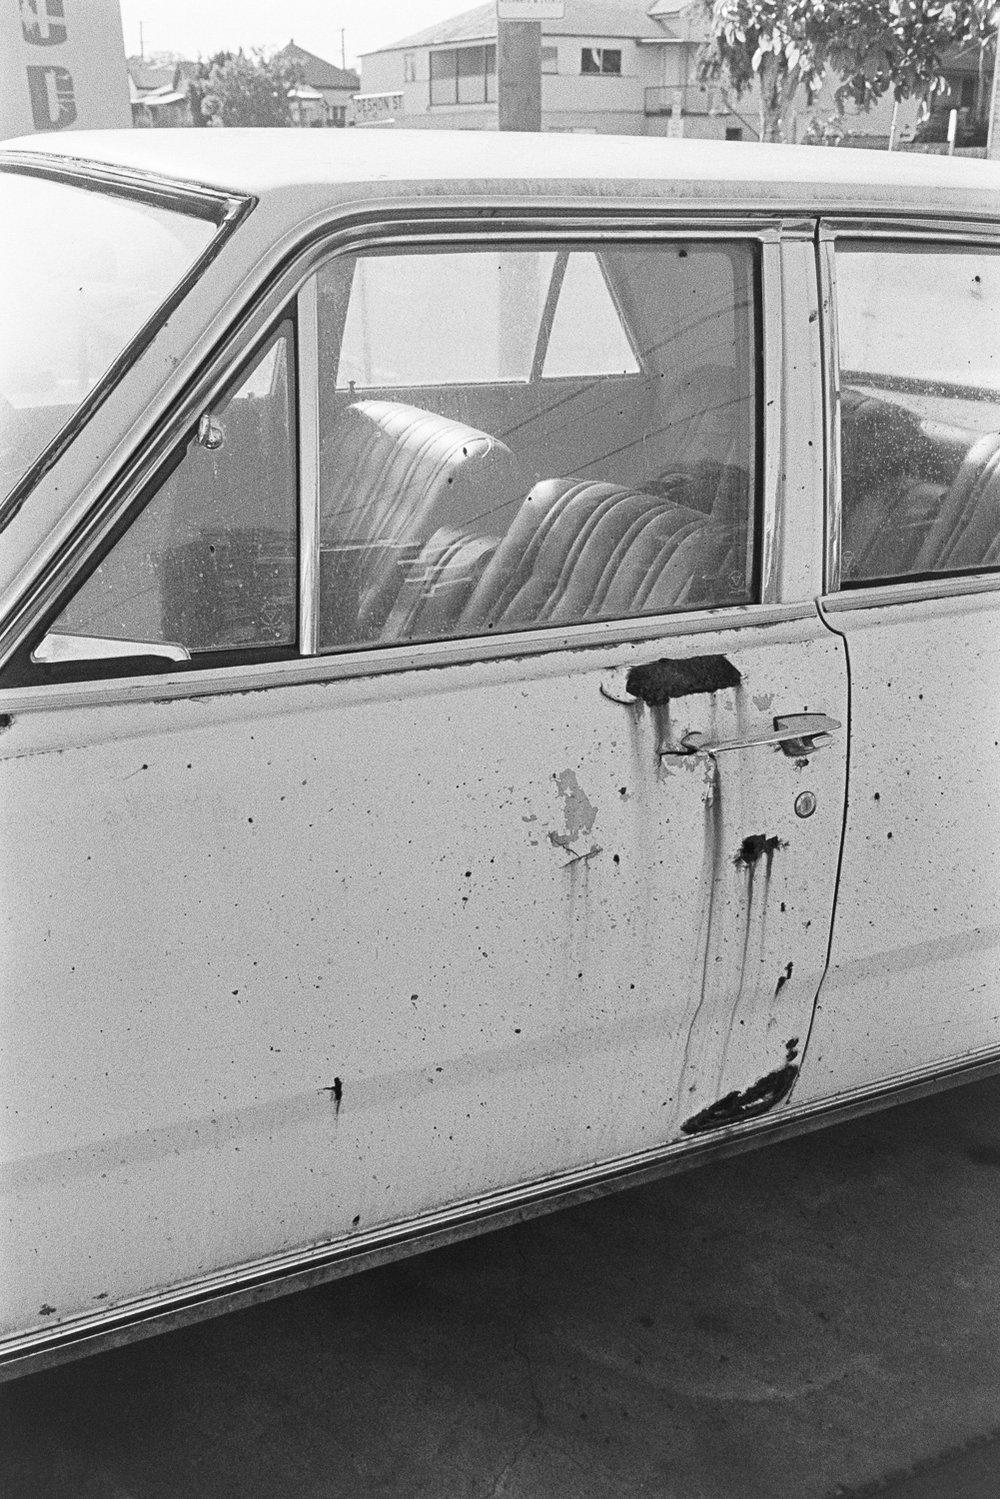 20190105 - Roll 269 - 009-Nick-Bedford,-Photographer-Black and White, Brisbane, Kodak TRI-X 400, Leica M7, Street Photography, Voigtlander 35mm F1.7.jpg